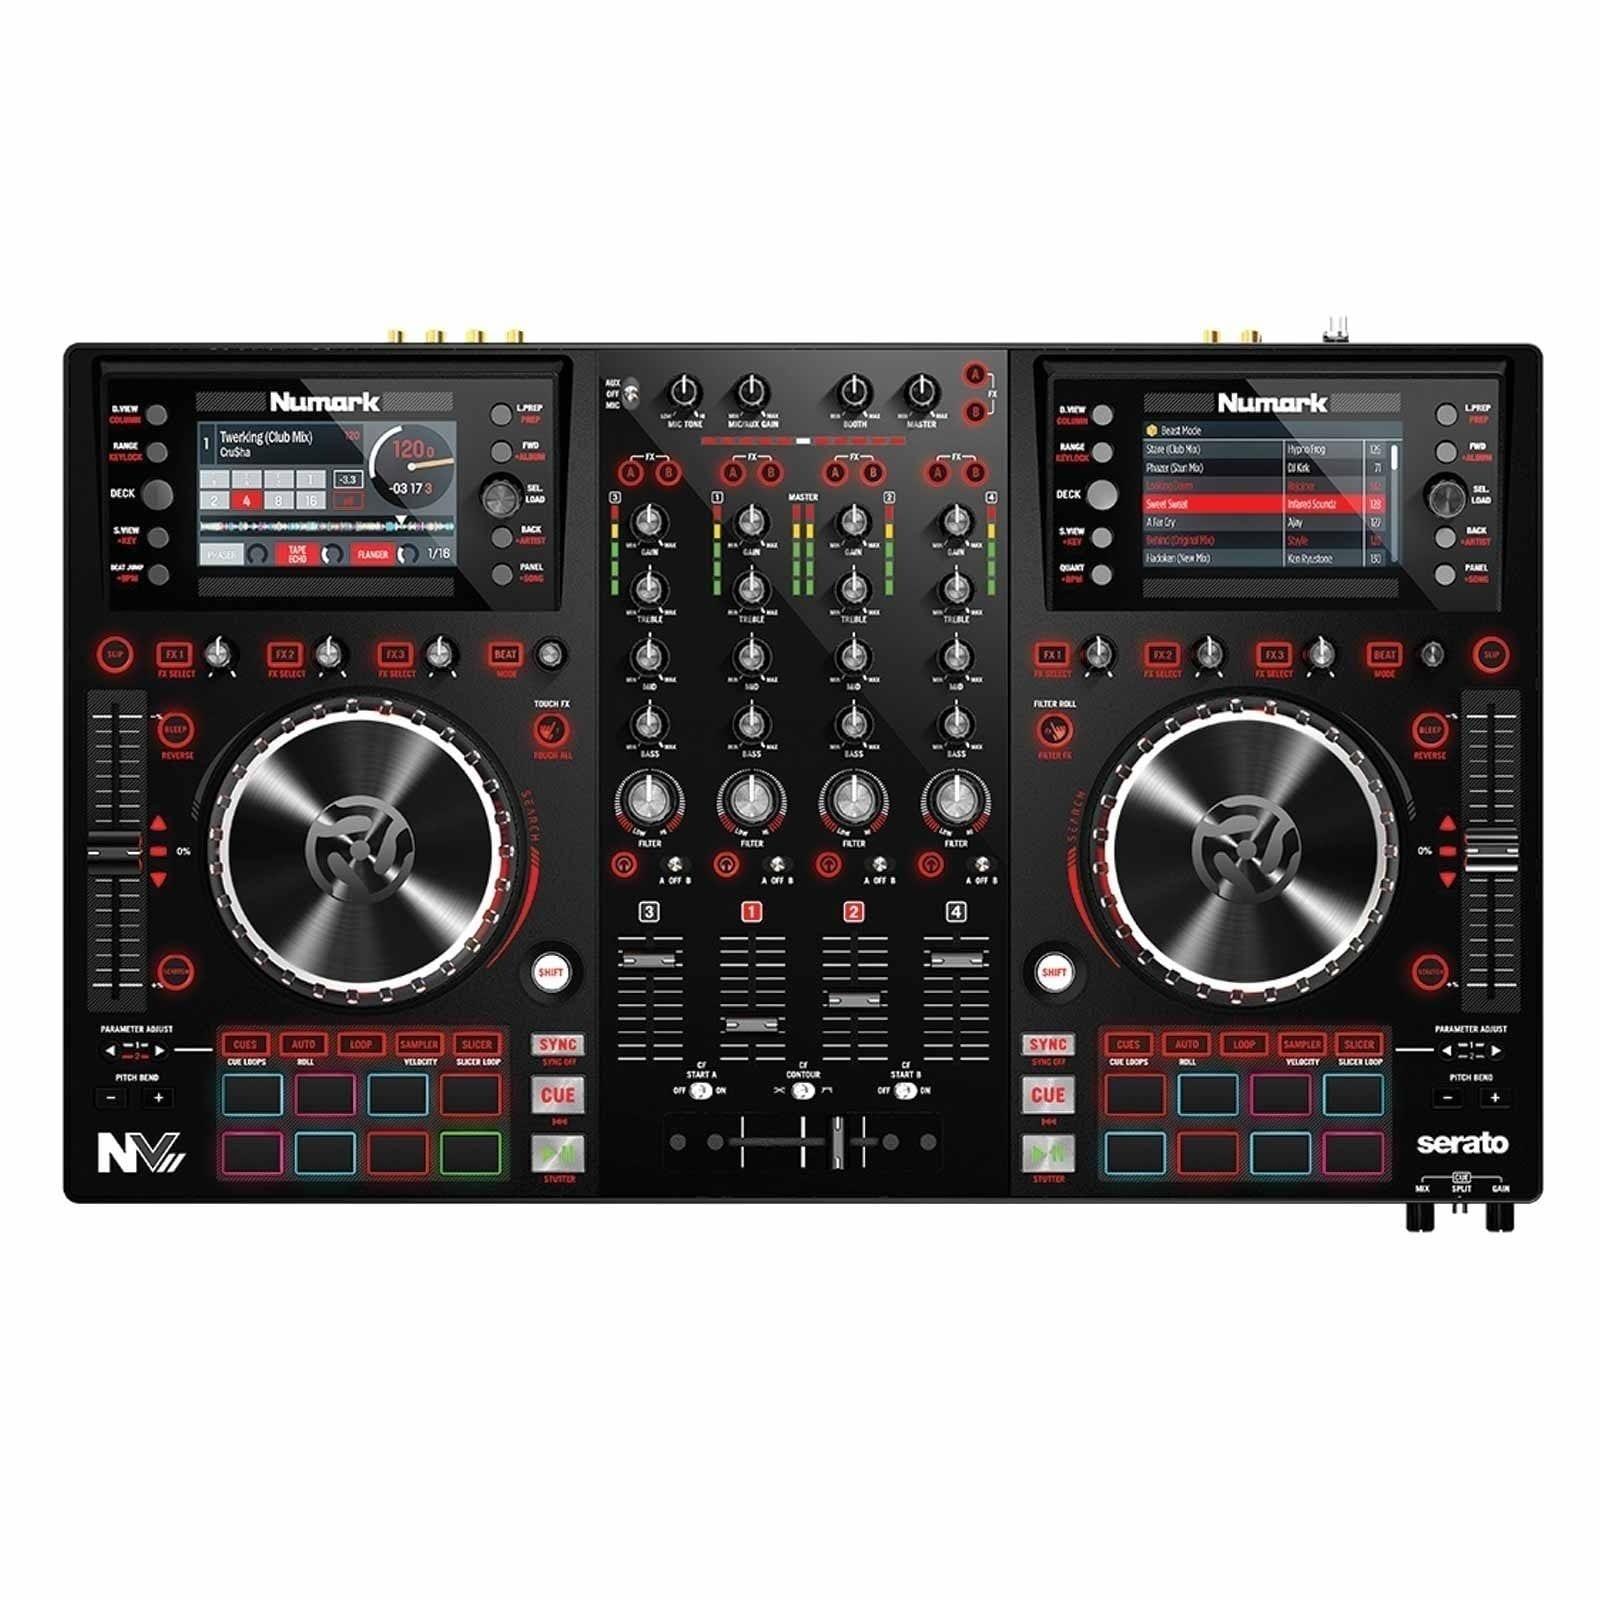 numark-nvii-intelligent-dual-display-serato-dj-controller-887